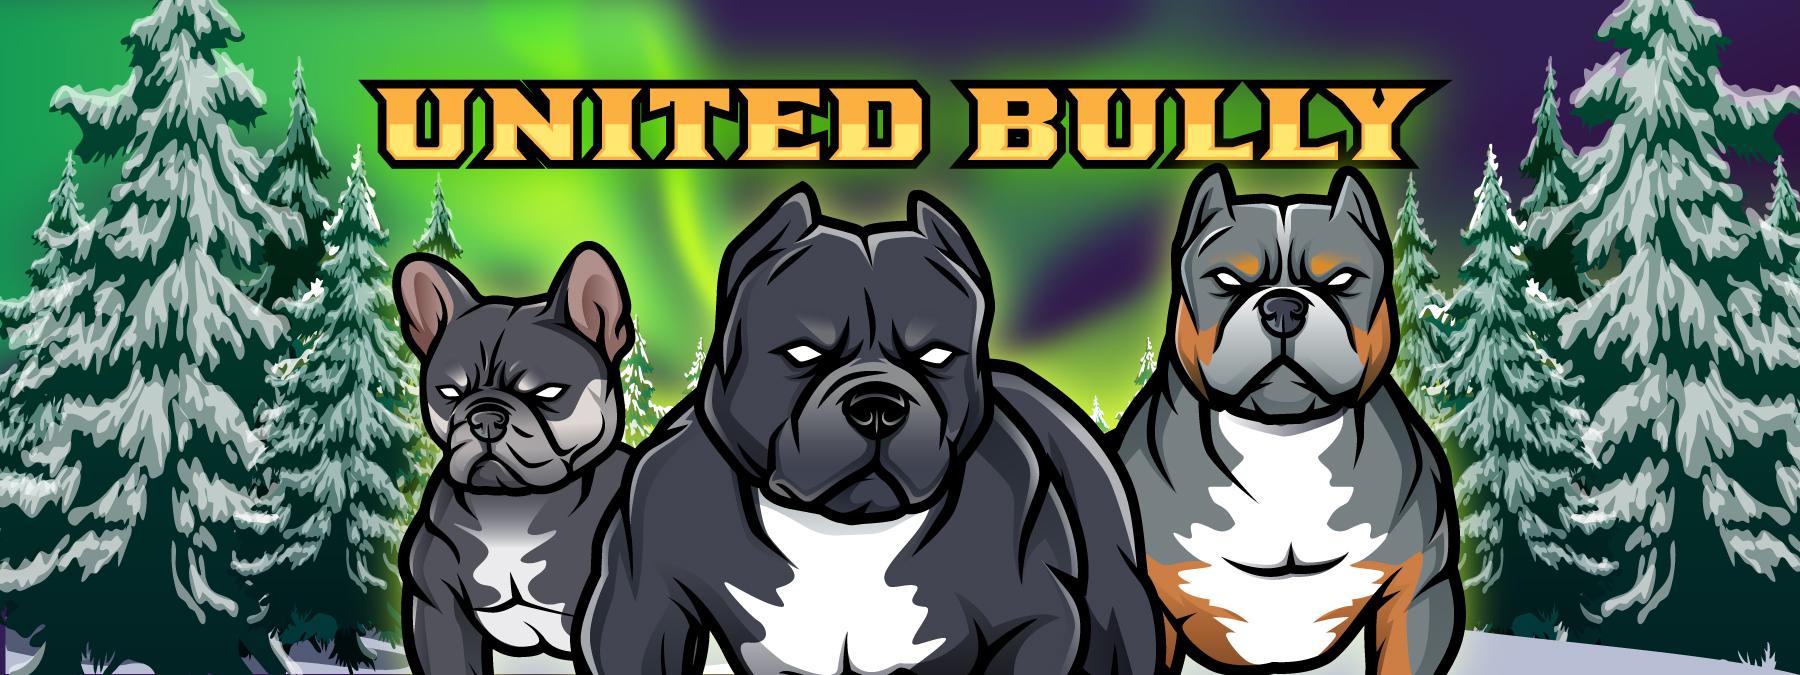 907 Pitbull & Bullies | The Last Frontier